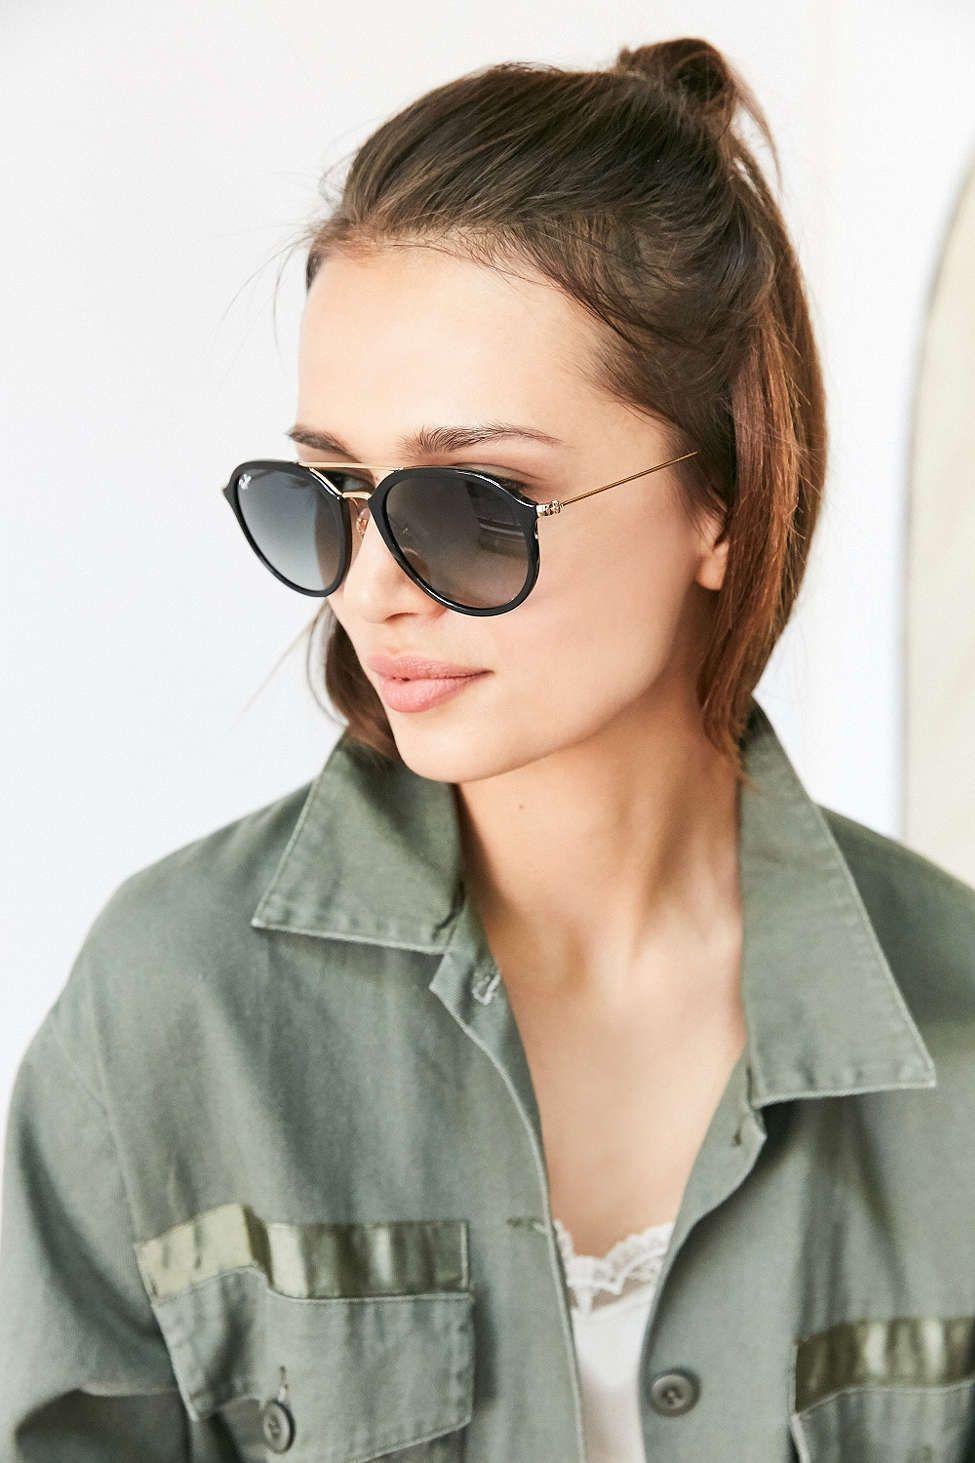 a790e15914 Ray-Ban Highstreet Aviator Sunglasses